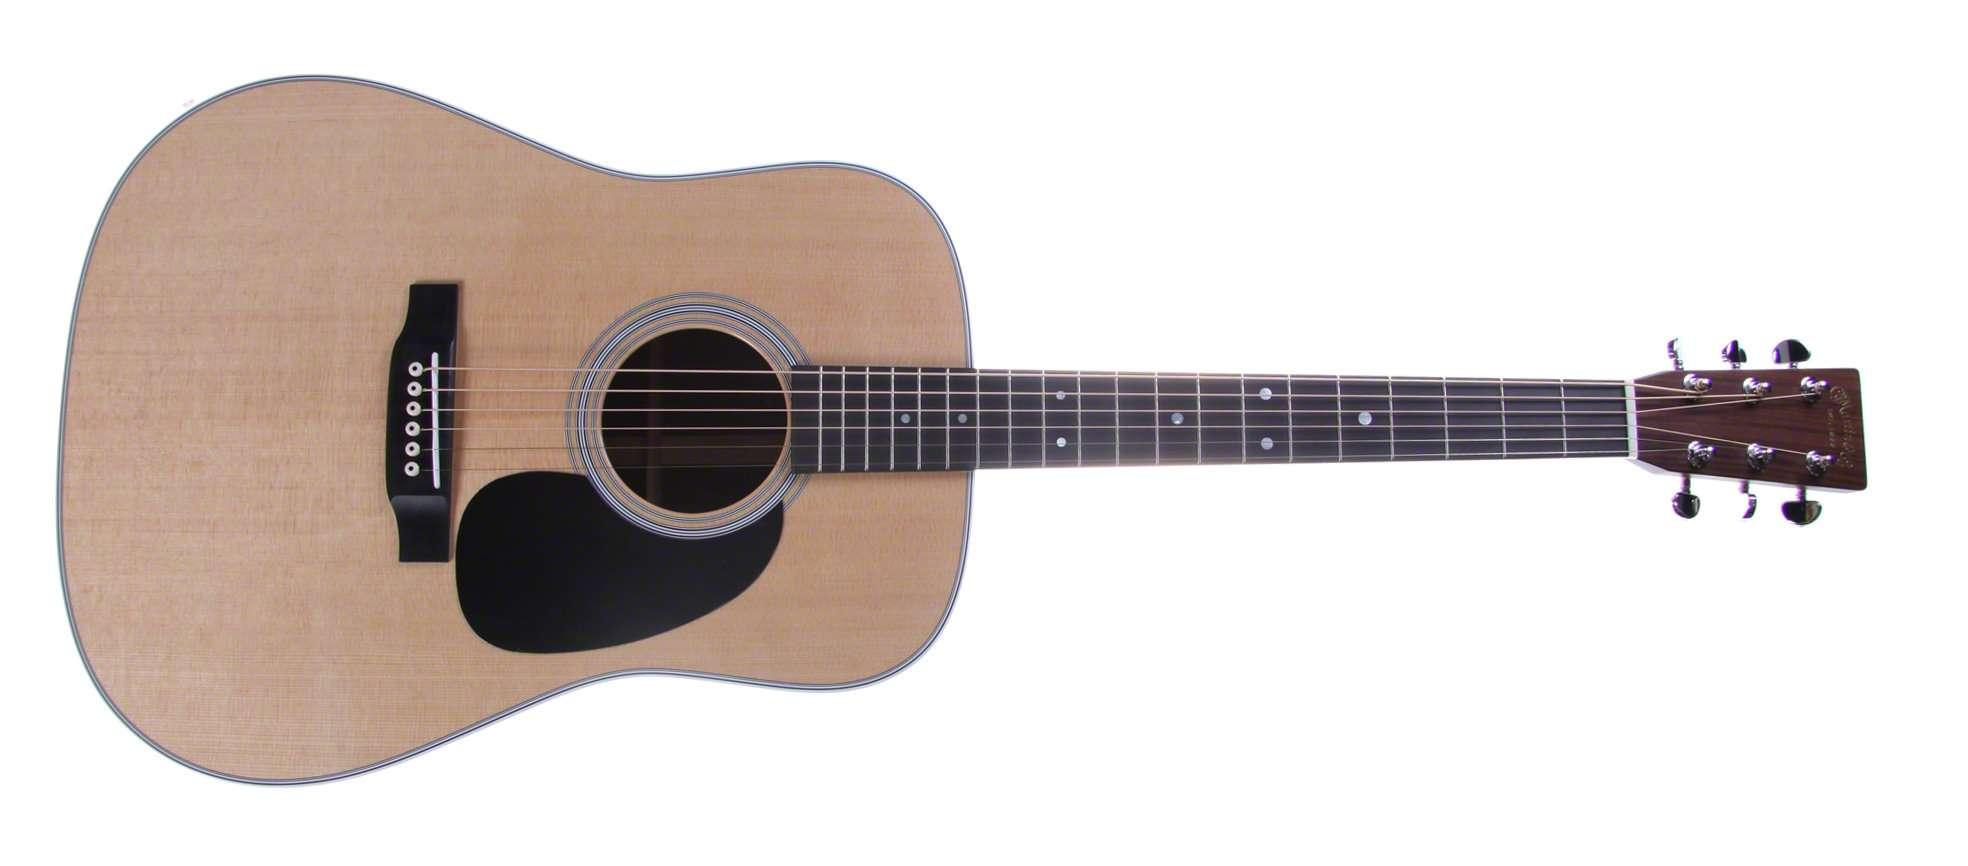 martin d 28 standard series dreadnought acoustic guitar katoomba music. Black Bedroom Furniture Sets. Home Design Ideas